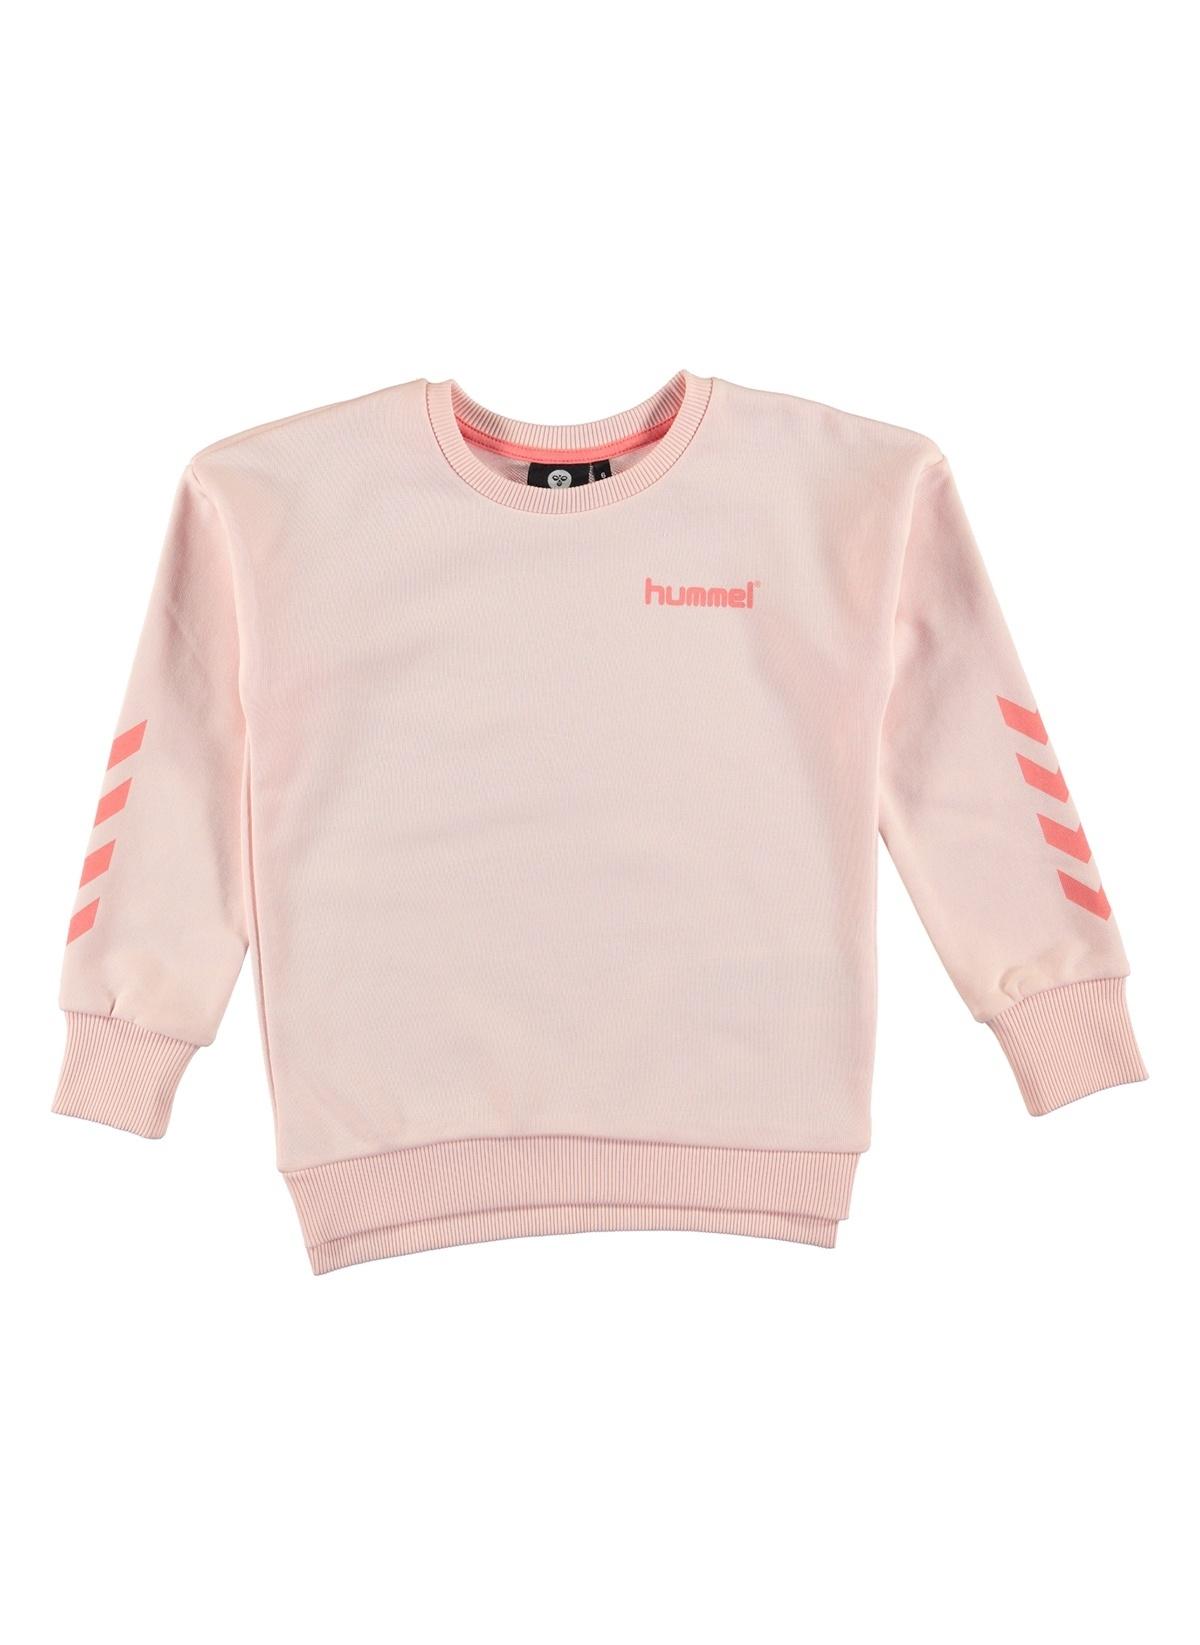 Hummel Sweatshirt 920354-8734-hmlflen–sweat-shırt – 129.95 TL